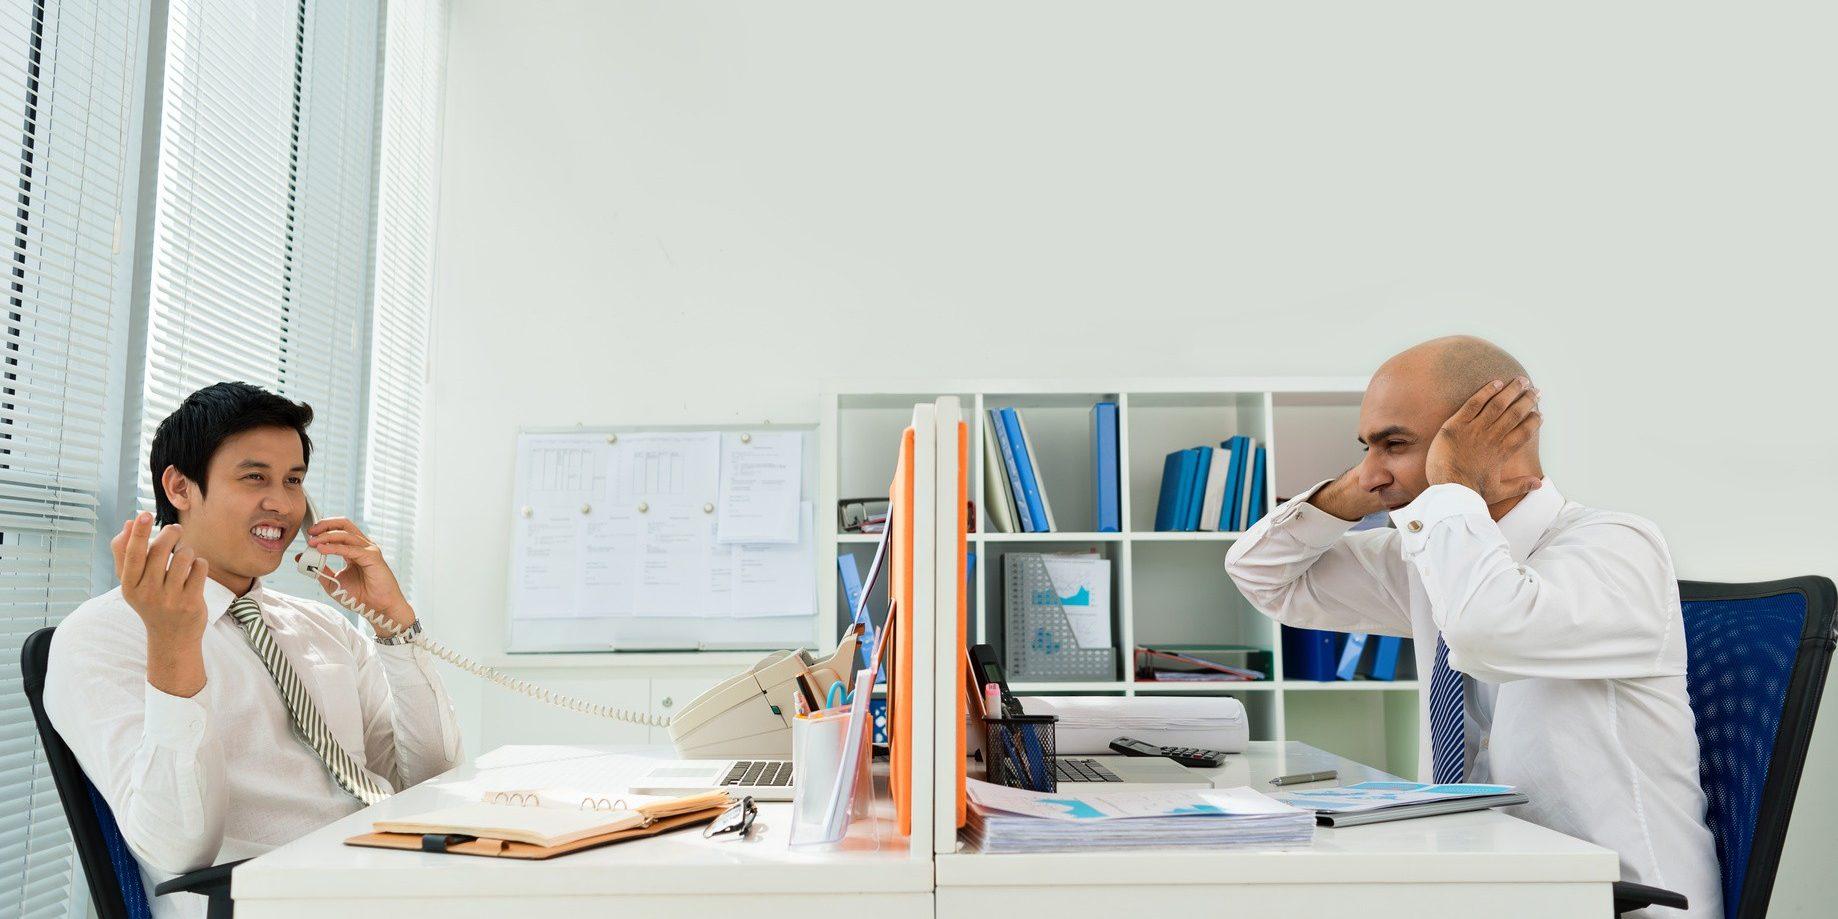 Studie zu Lärm durch Kollegen im Büro: Babyboomer vs. Generation Z